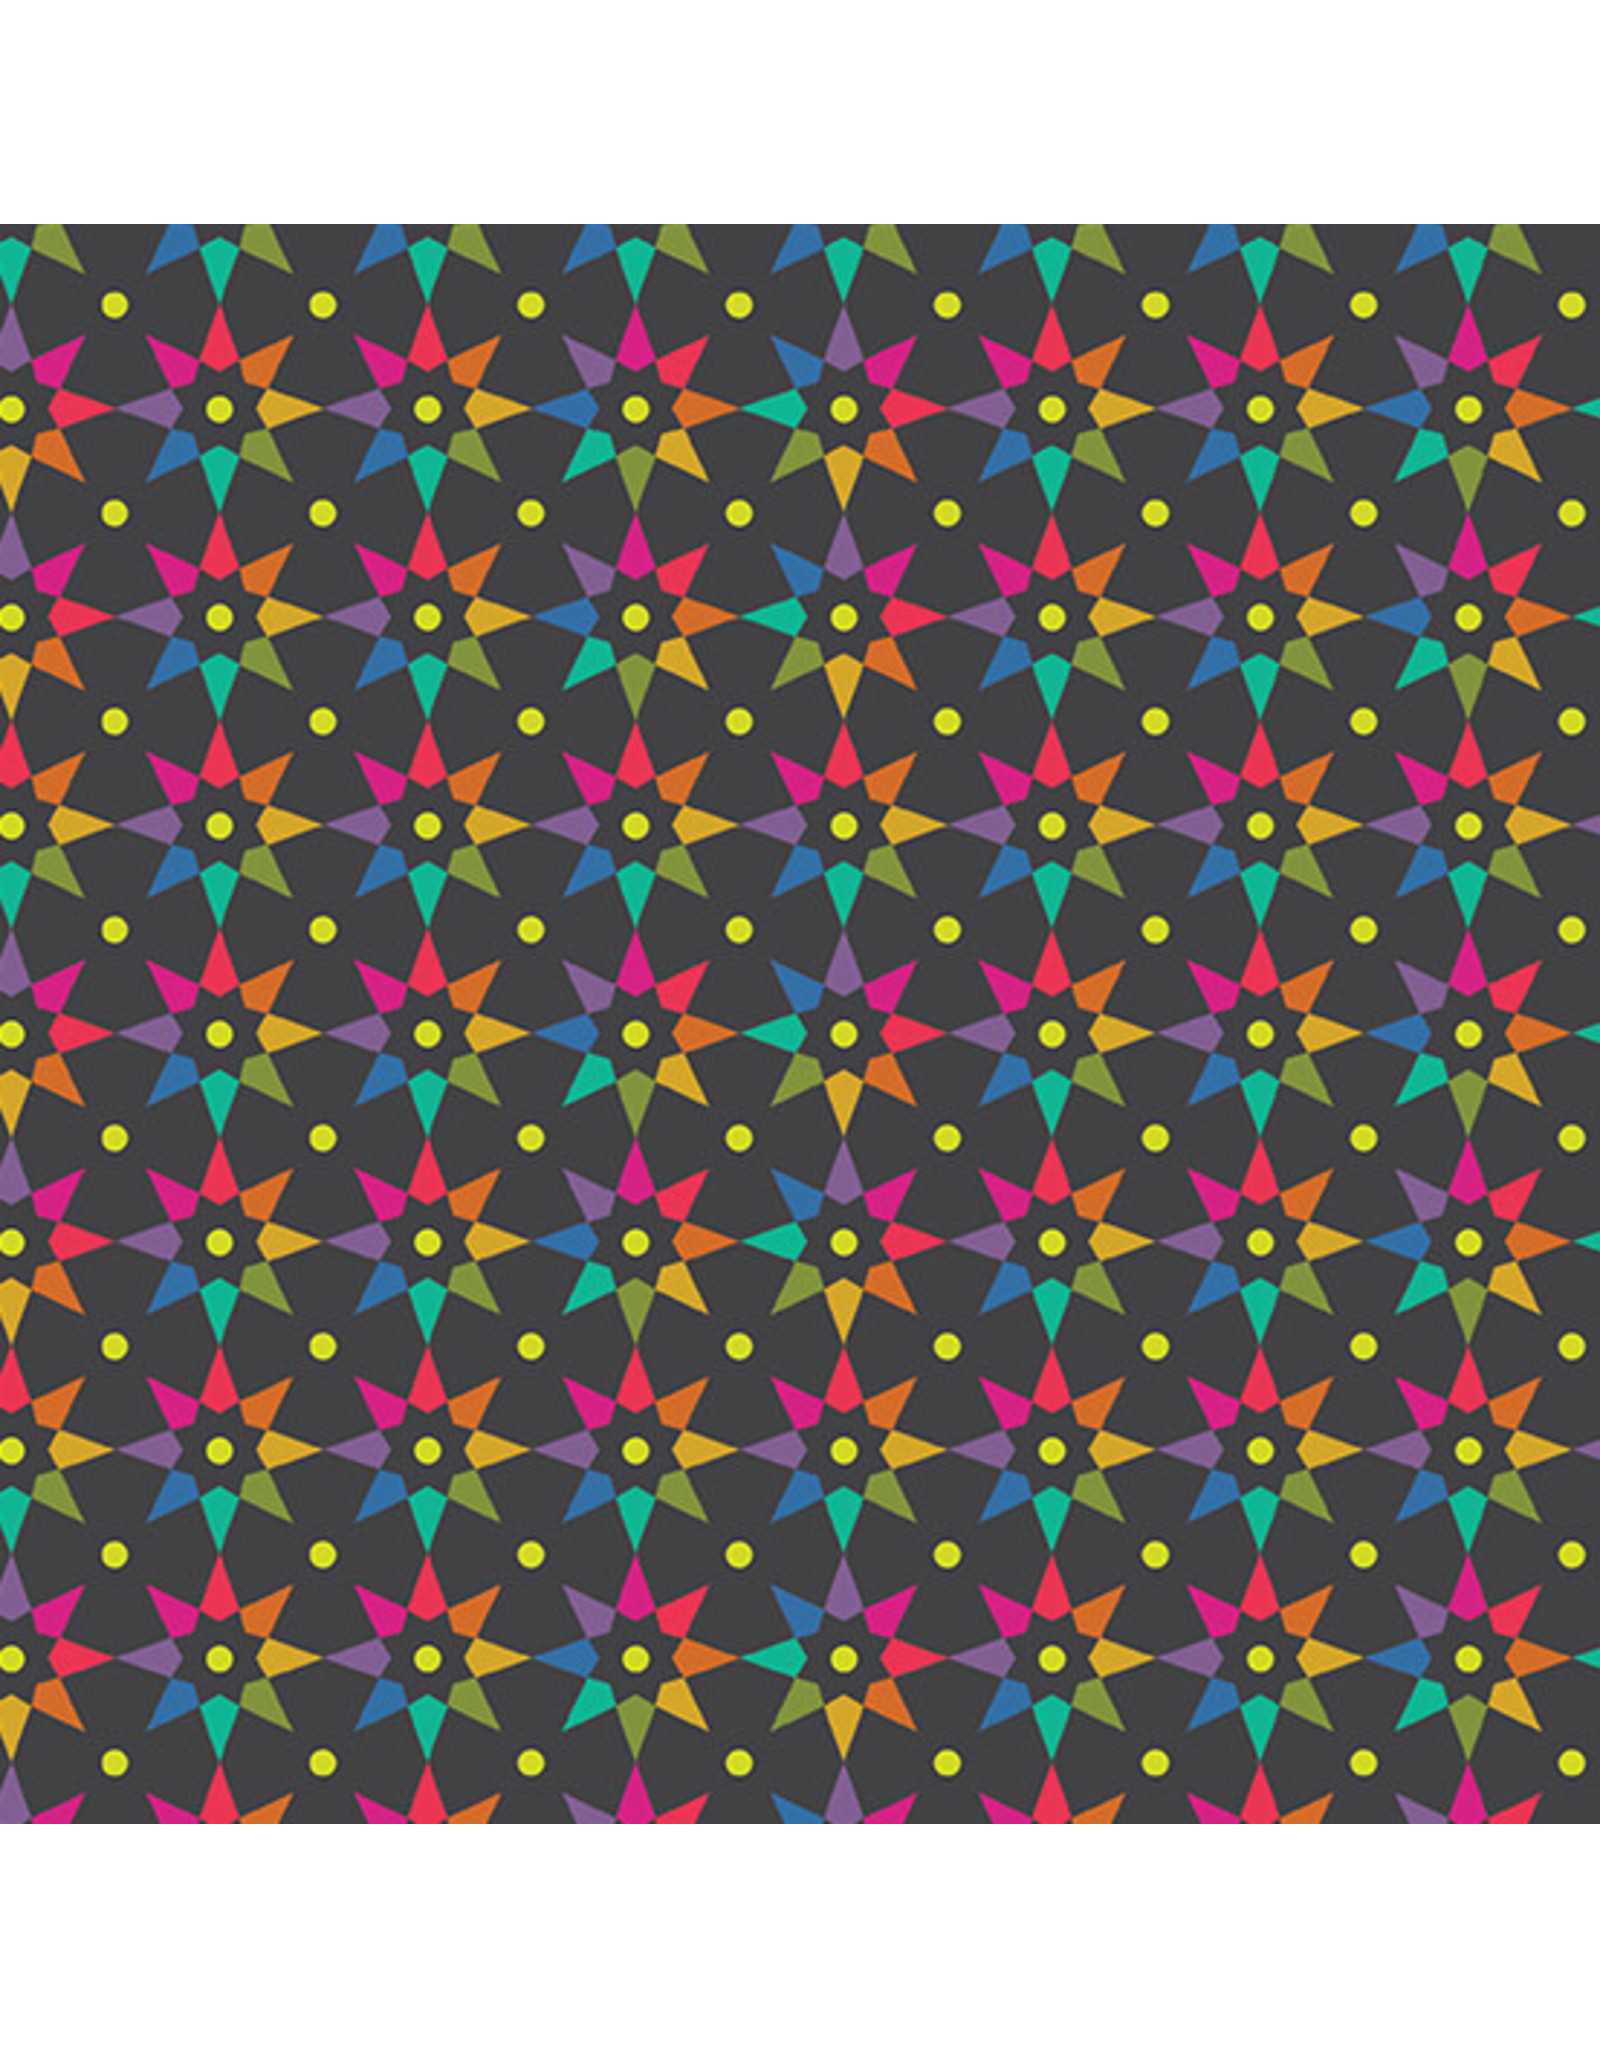 Andover Art Theory - Rainbow Star Night